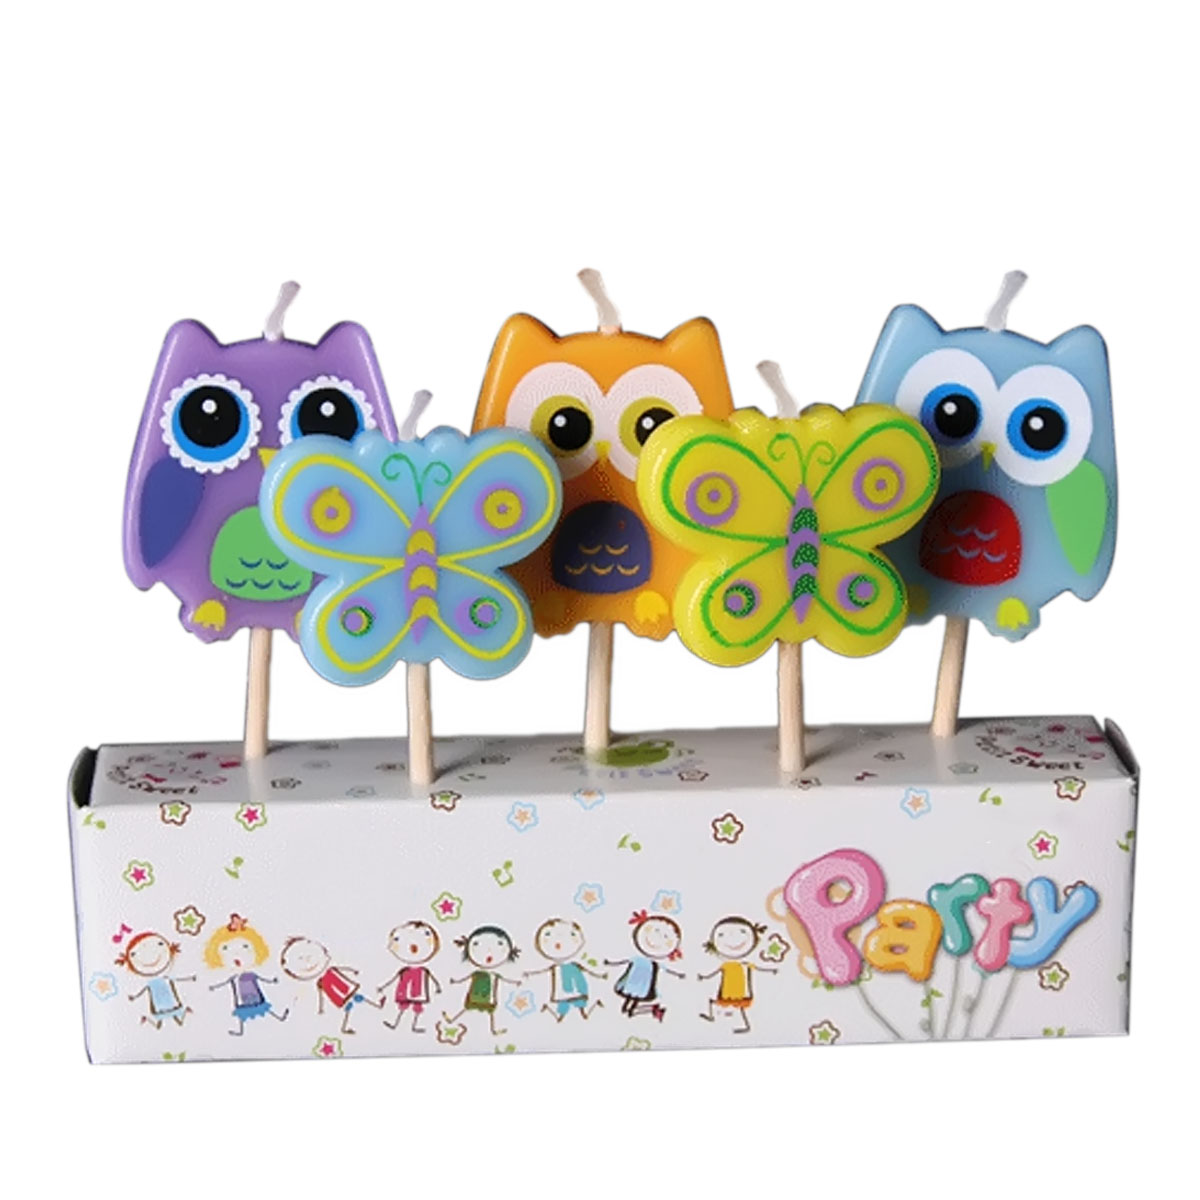 5 Pcs Parafin Gambar Kartun Anak Pesta Ulang Tahun Kue Lilin Dekorasi dengan Tongkat Kayu Burung Hantu dan Kupu-kupu